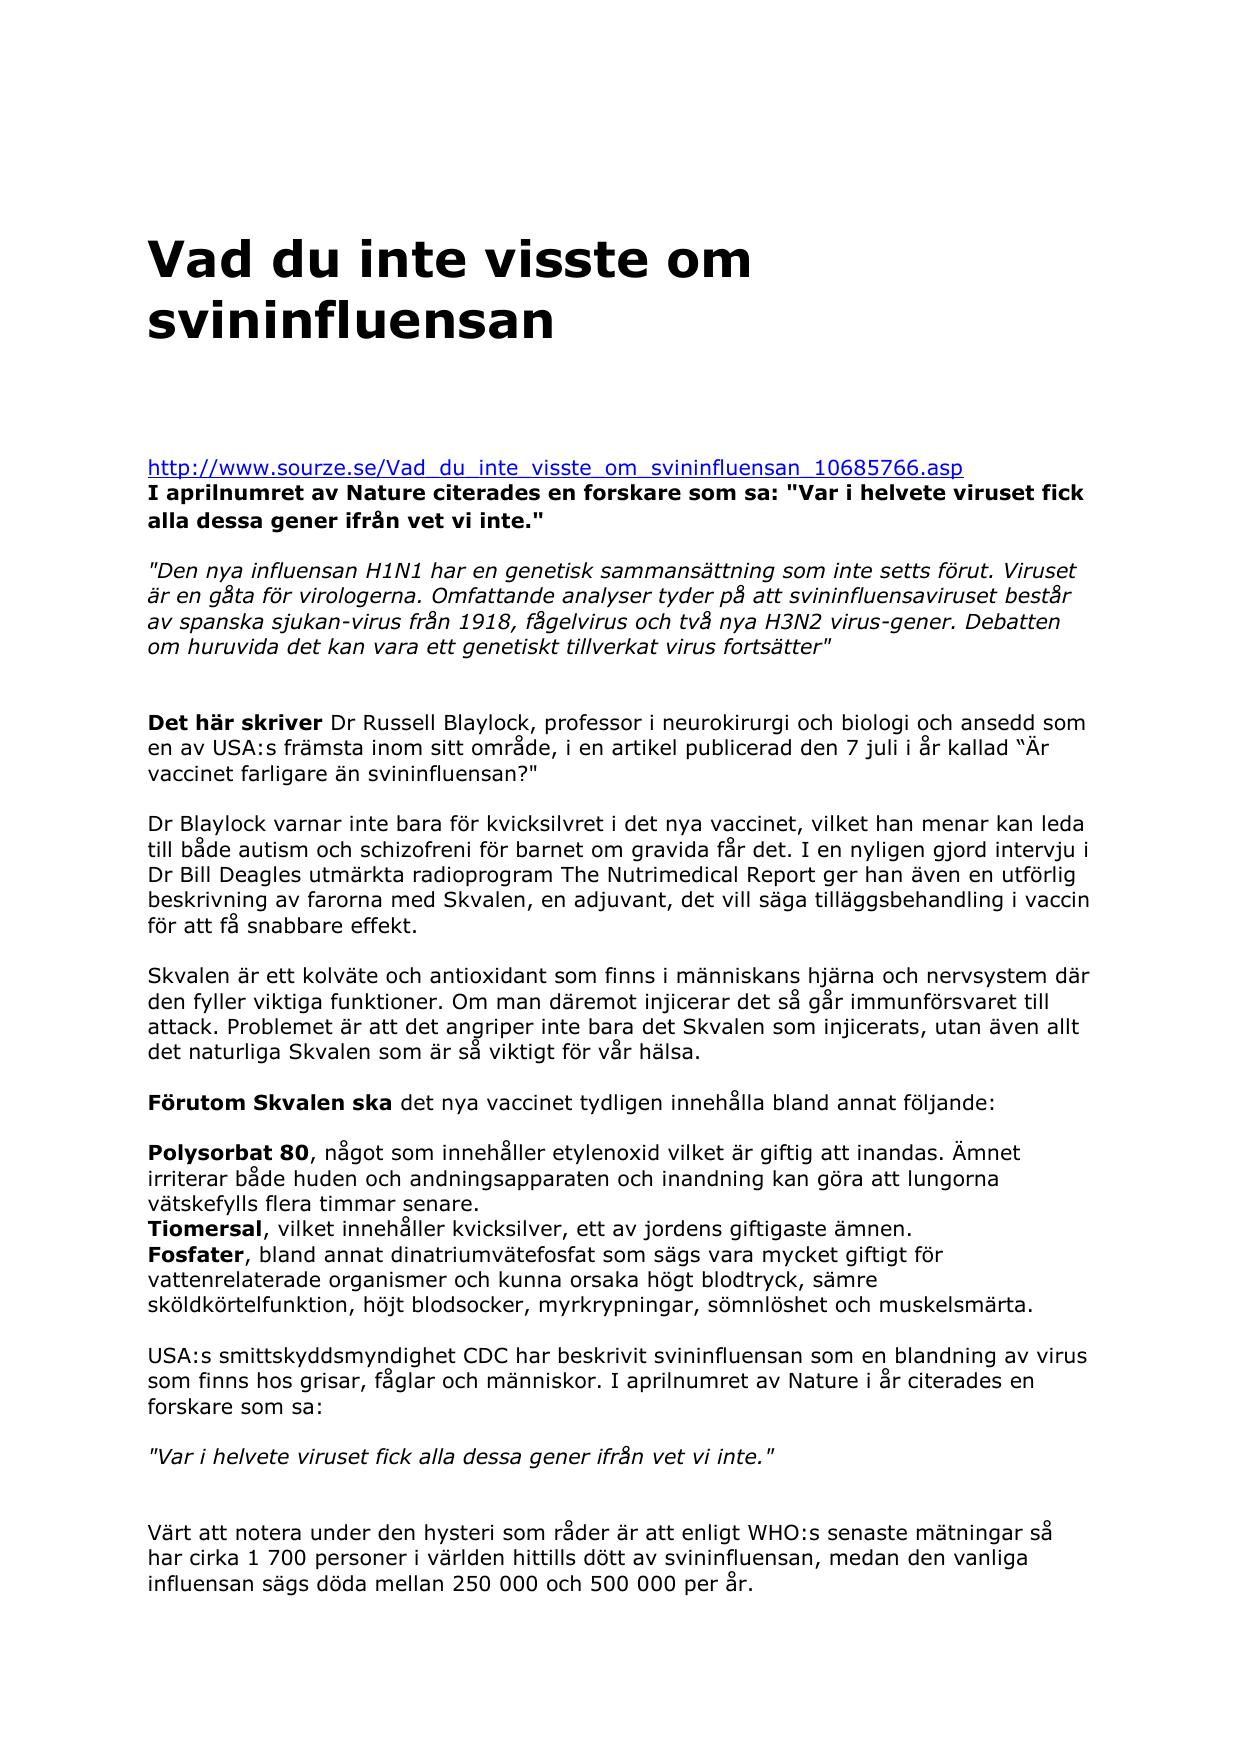 Atta doda i svininfluensan i storbritannien